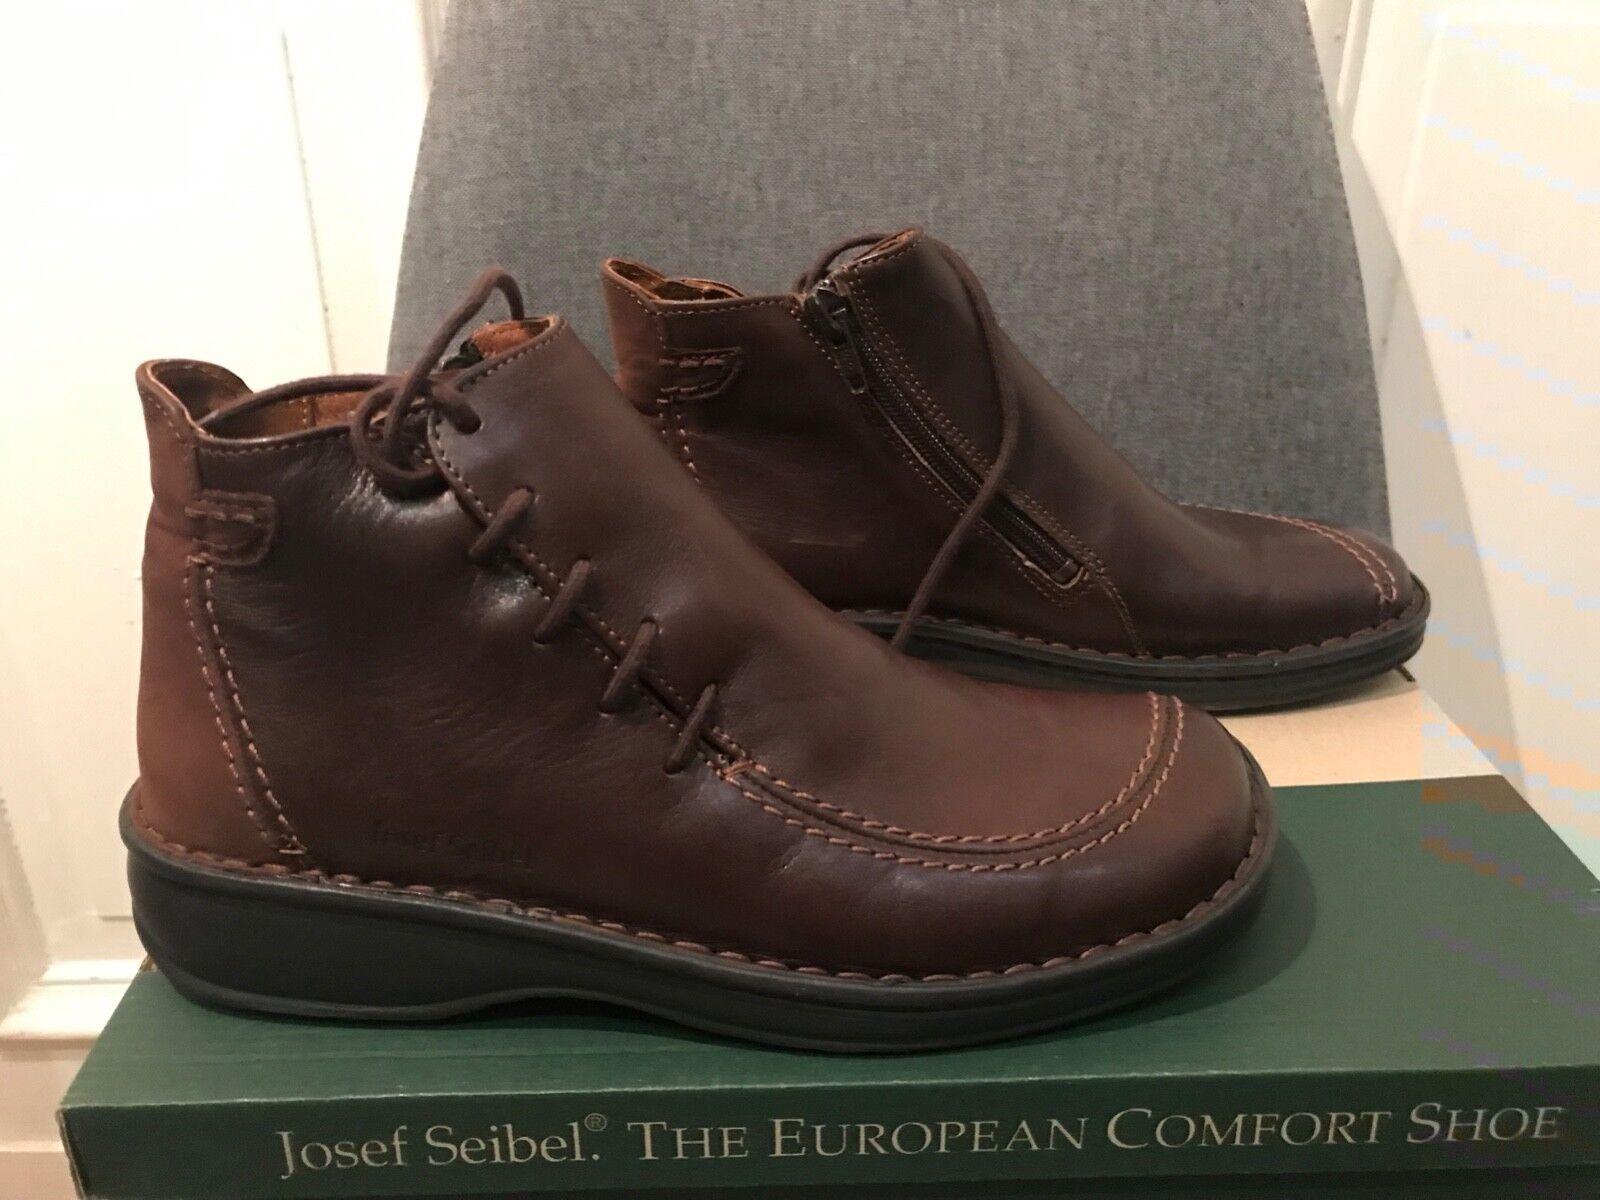 JOSEF SEIBEL cuir Chaussures Femmes Bottes Chaussures noir taille 37 peu porté